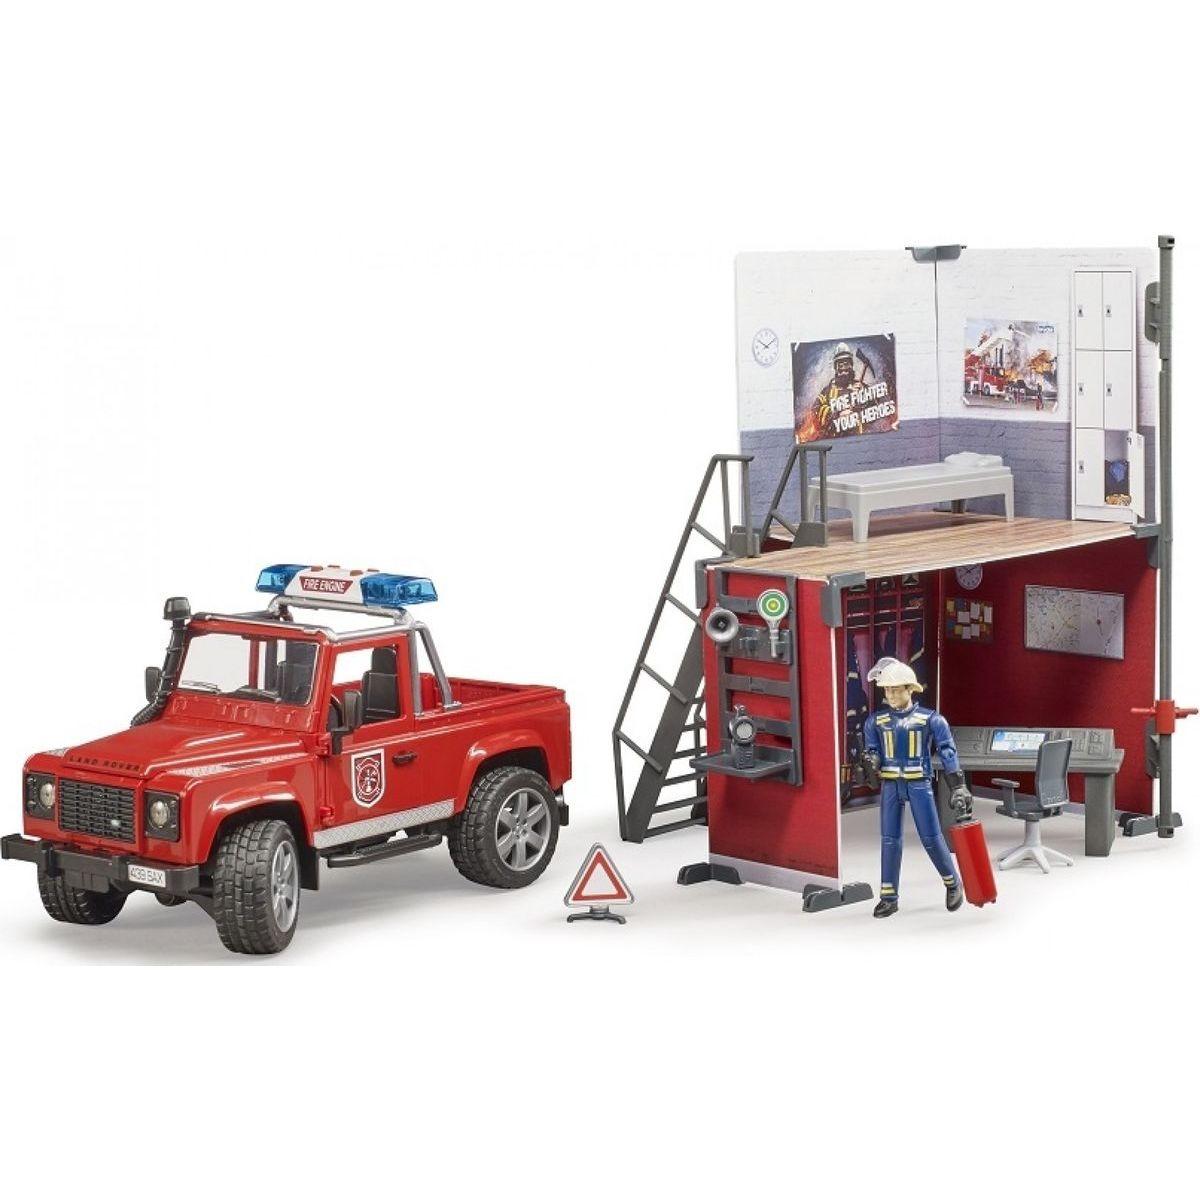 Bruder 62701 Land Rover Defender hasiči sa stanicou